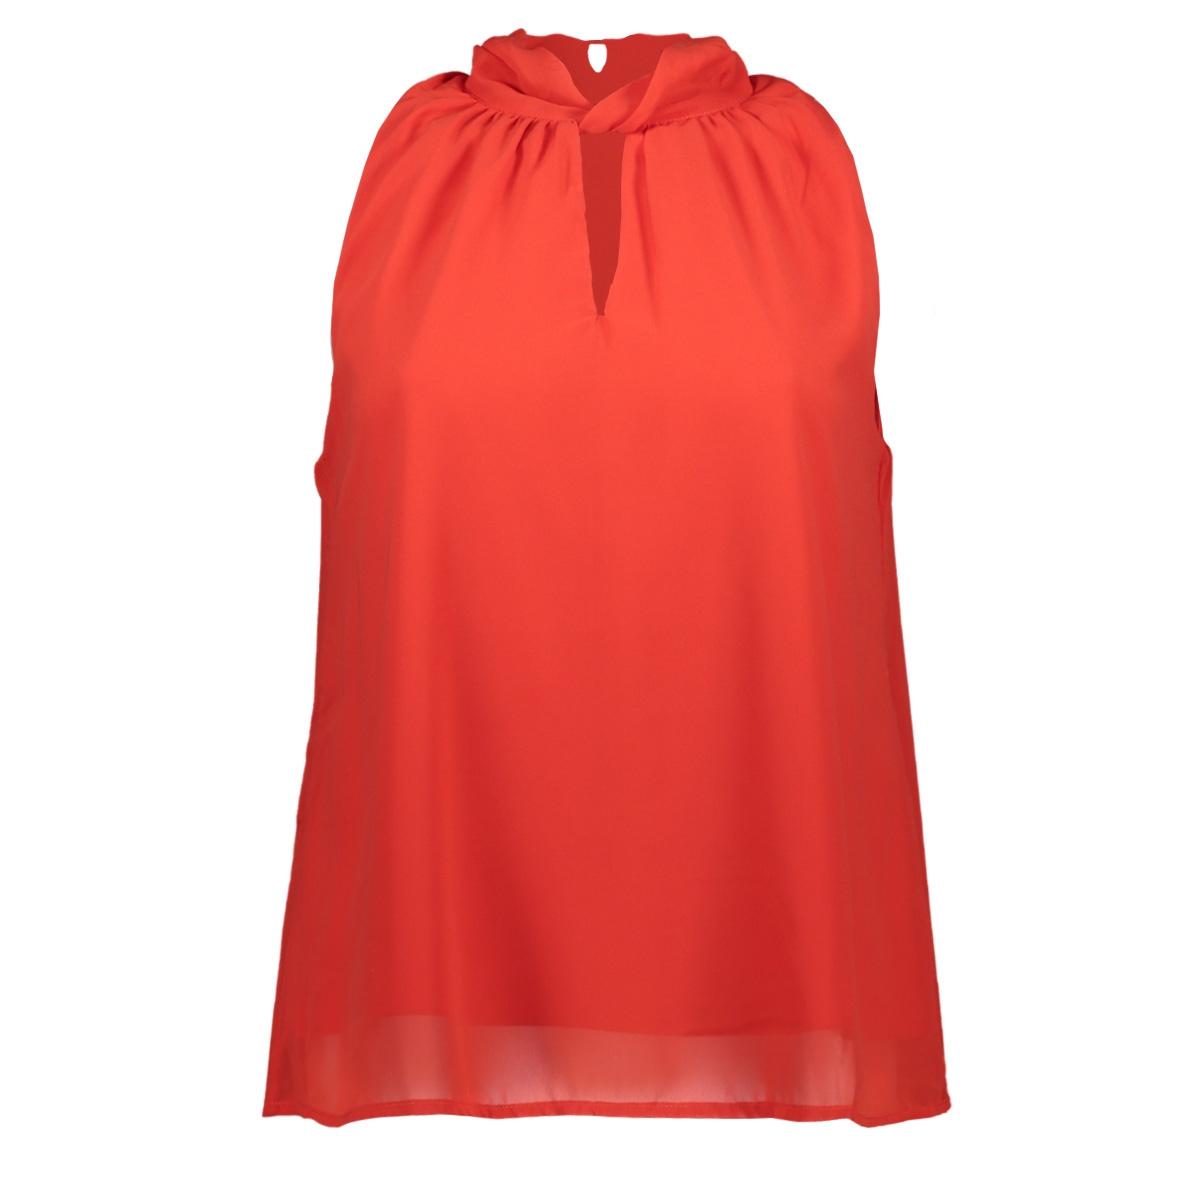 vmline s/l highneck top 10213645 vero moda top fiery red